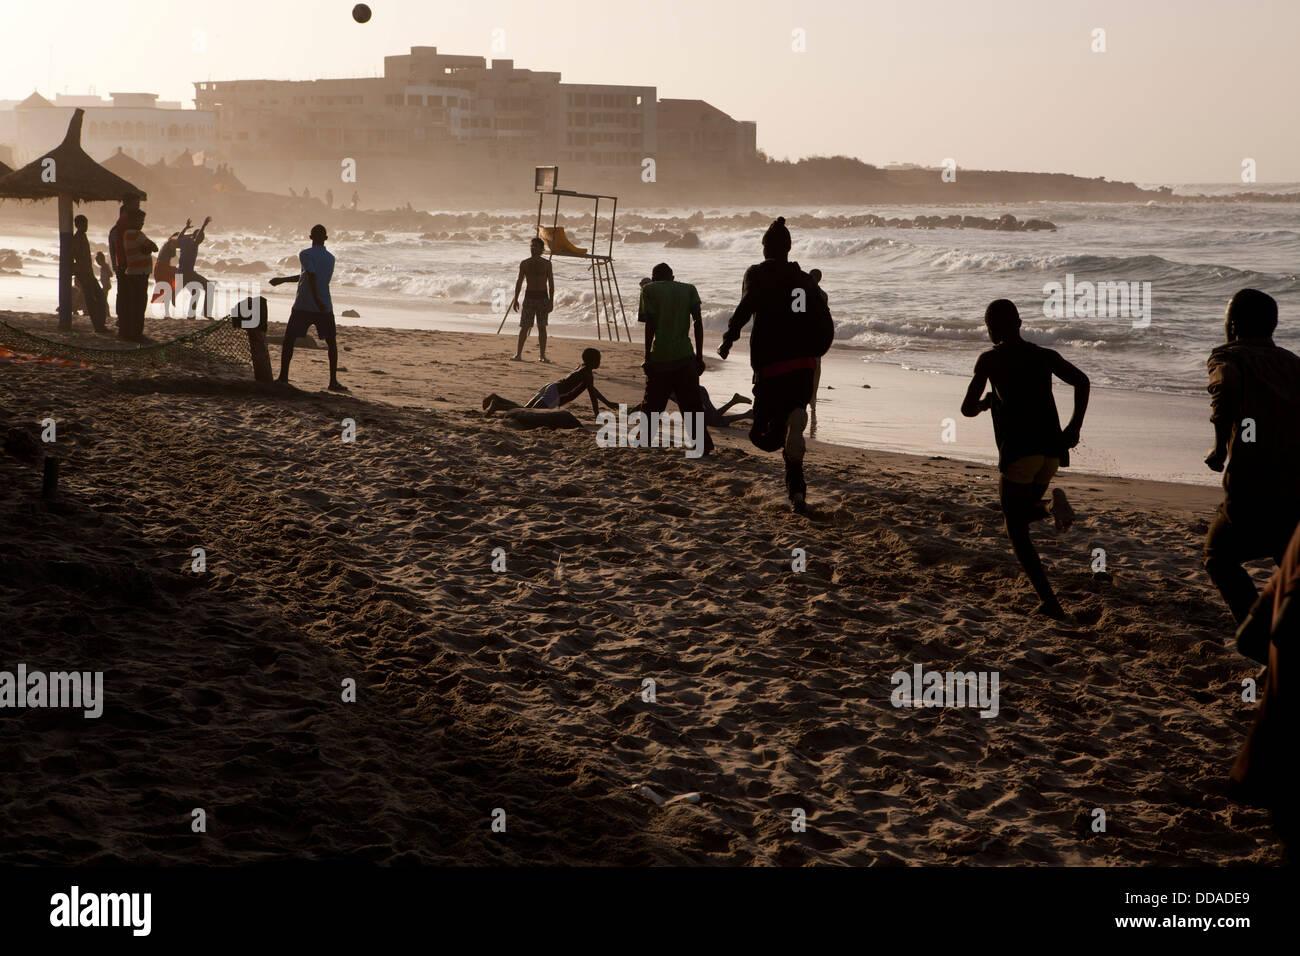 La vida de playa en Dakar, Senegal. Imagen De Stock